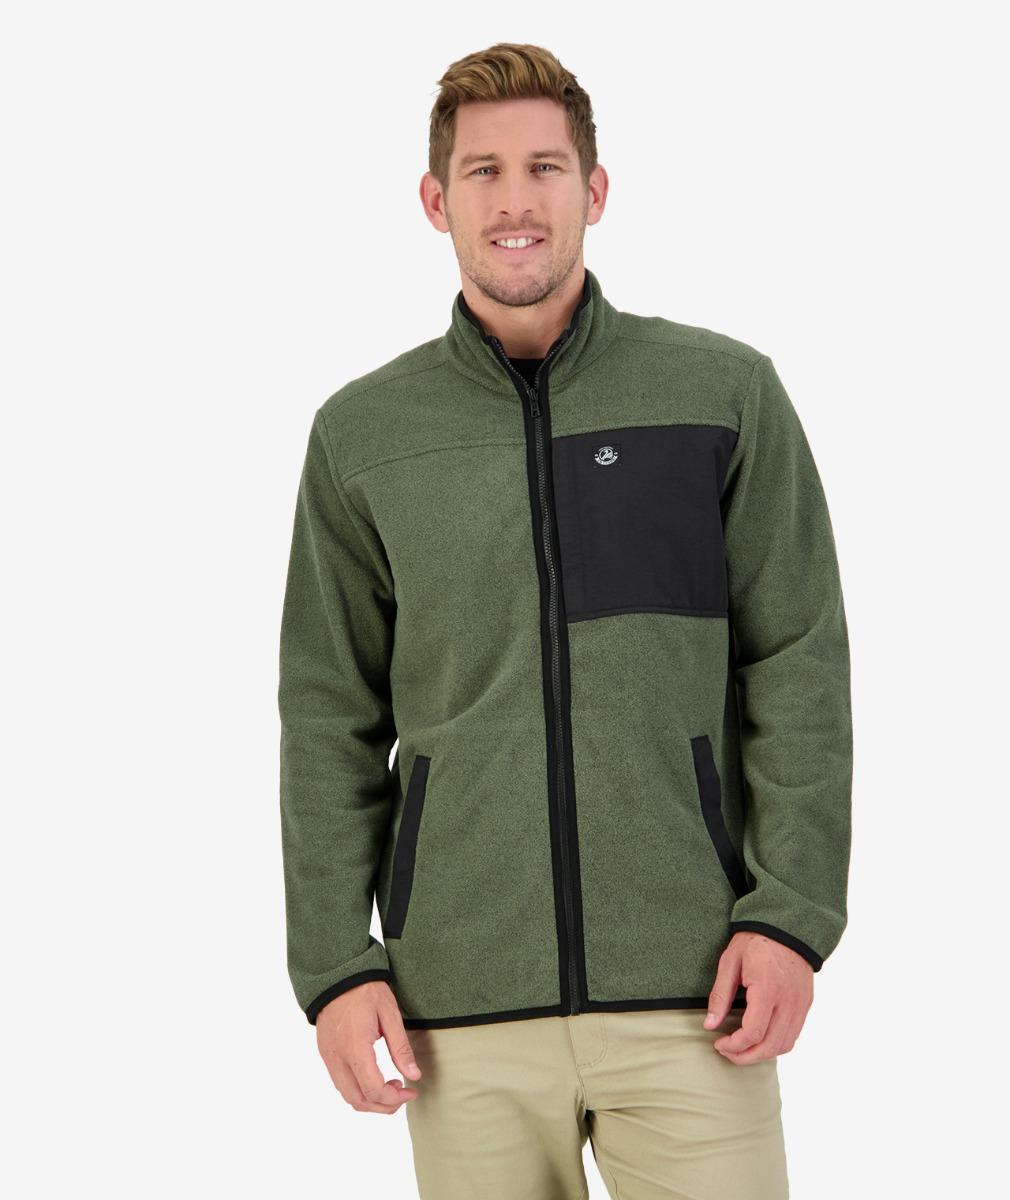 Hazelburn Fleece Jacket in Olive